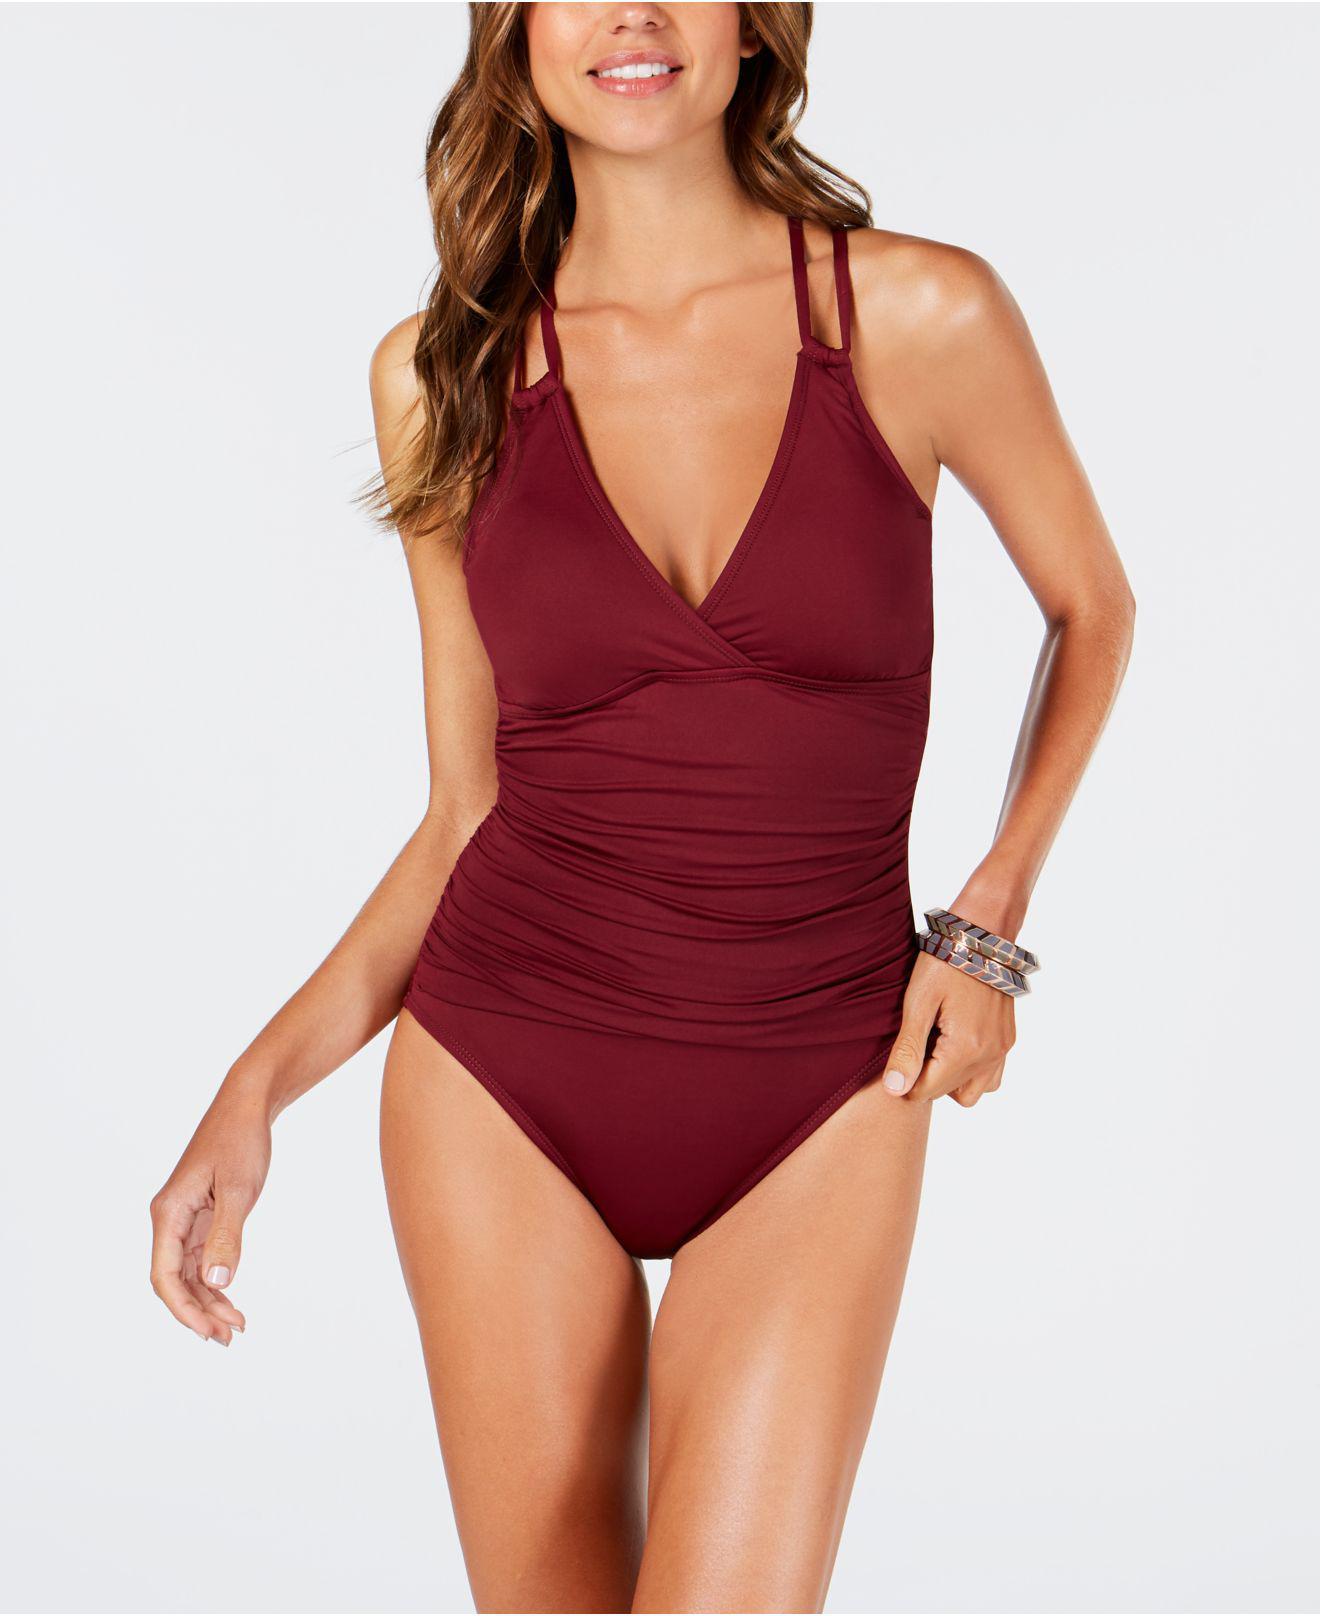 c0889393379ec La Blanca. Women s Red Island Goddess Underwire Tummy Control Cross-back One -piece Swimsuit